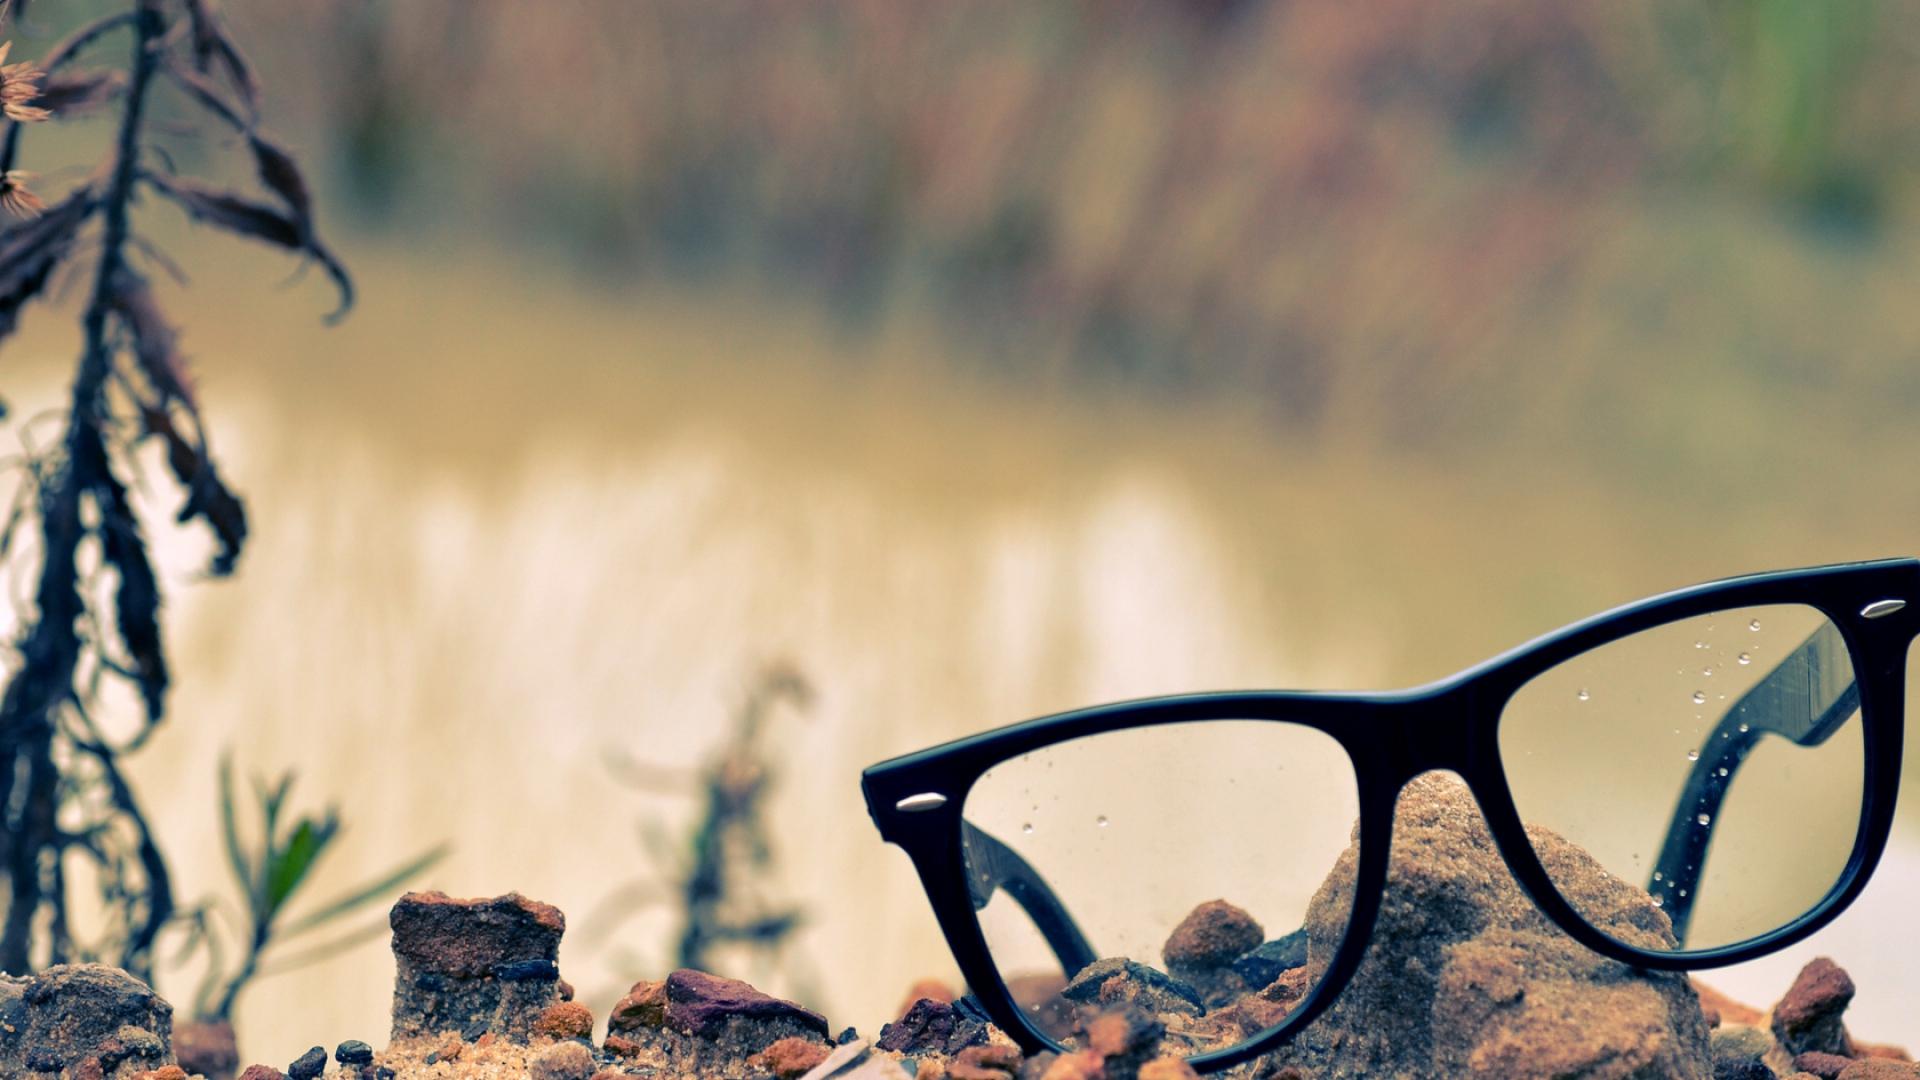 Download Wallpaper 1920x1080 Glasses, Lenses, Rocks, Grass